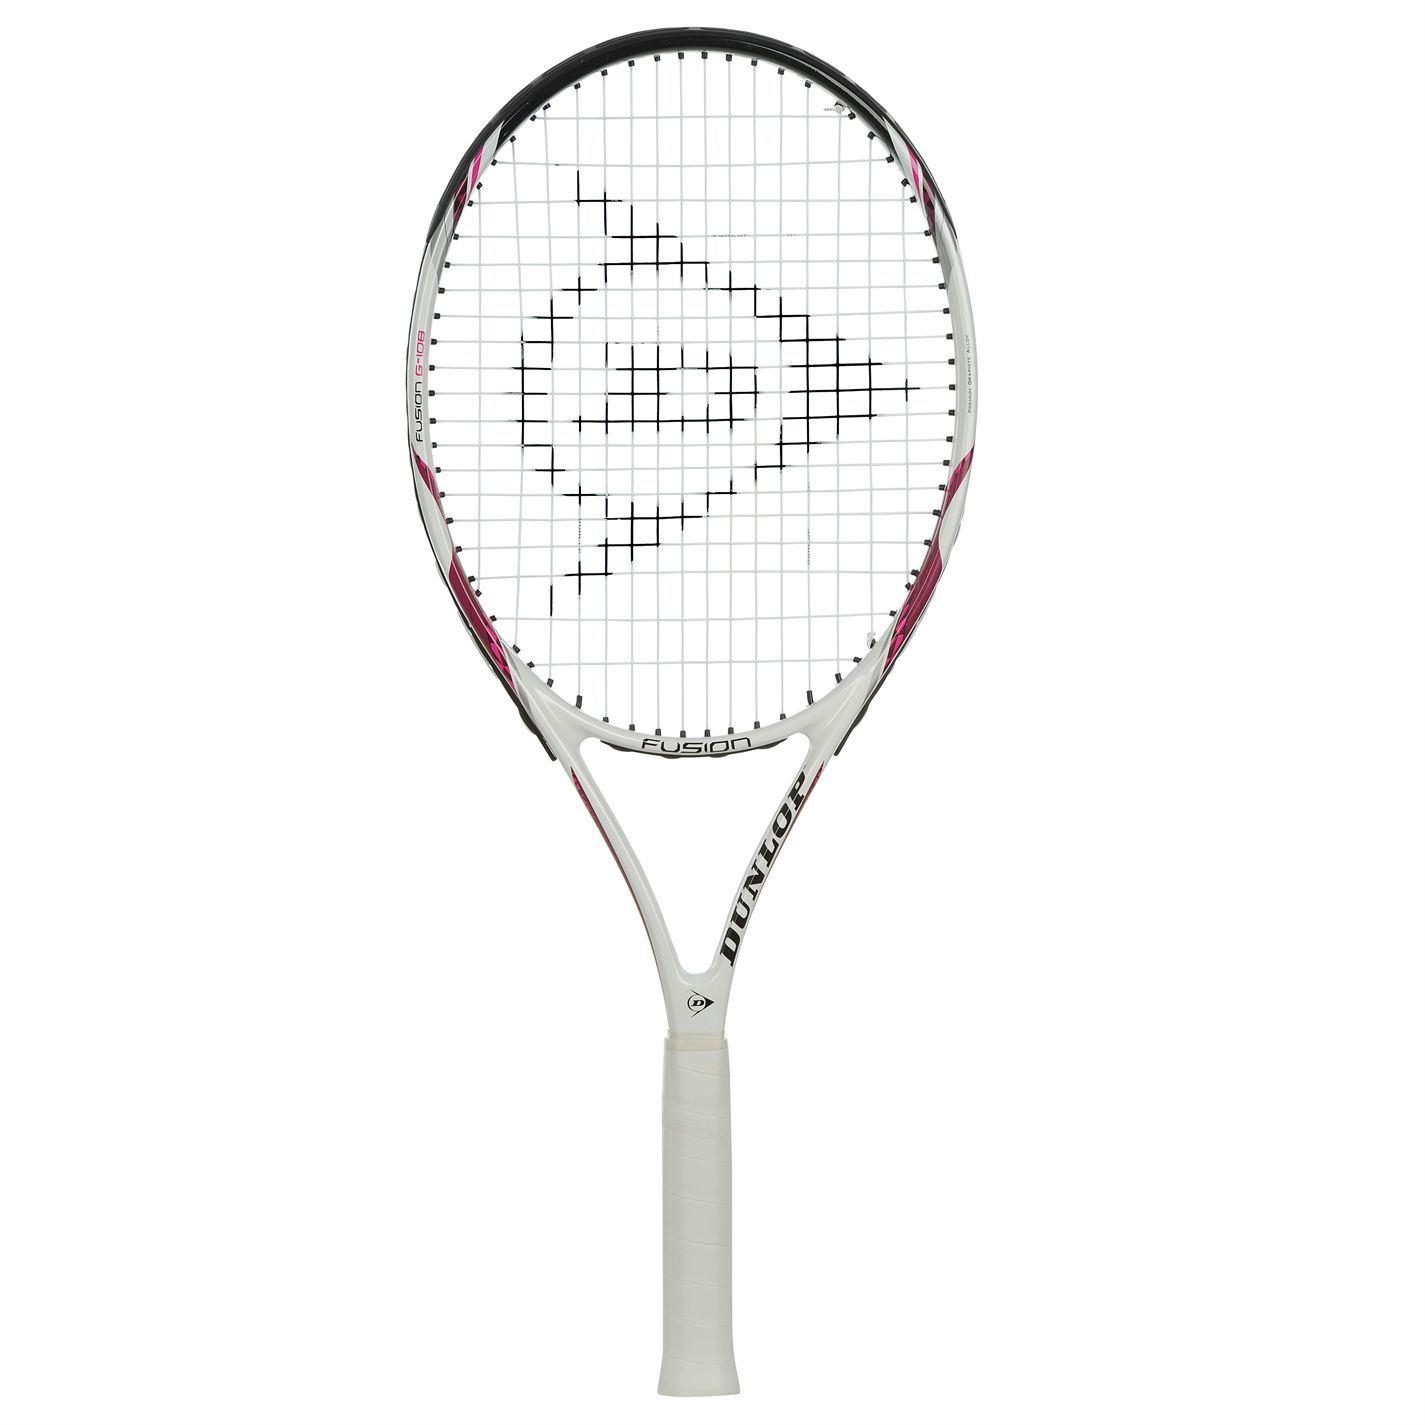 Dunlop Fusion G108 Tennis Racket Raquet White Pink | eBay